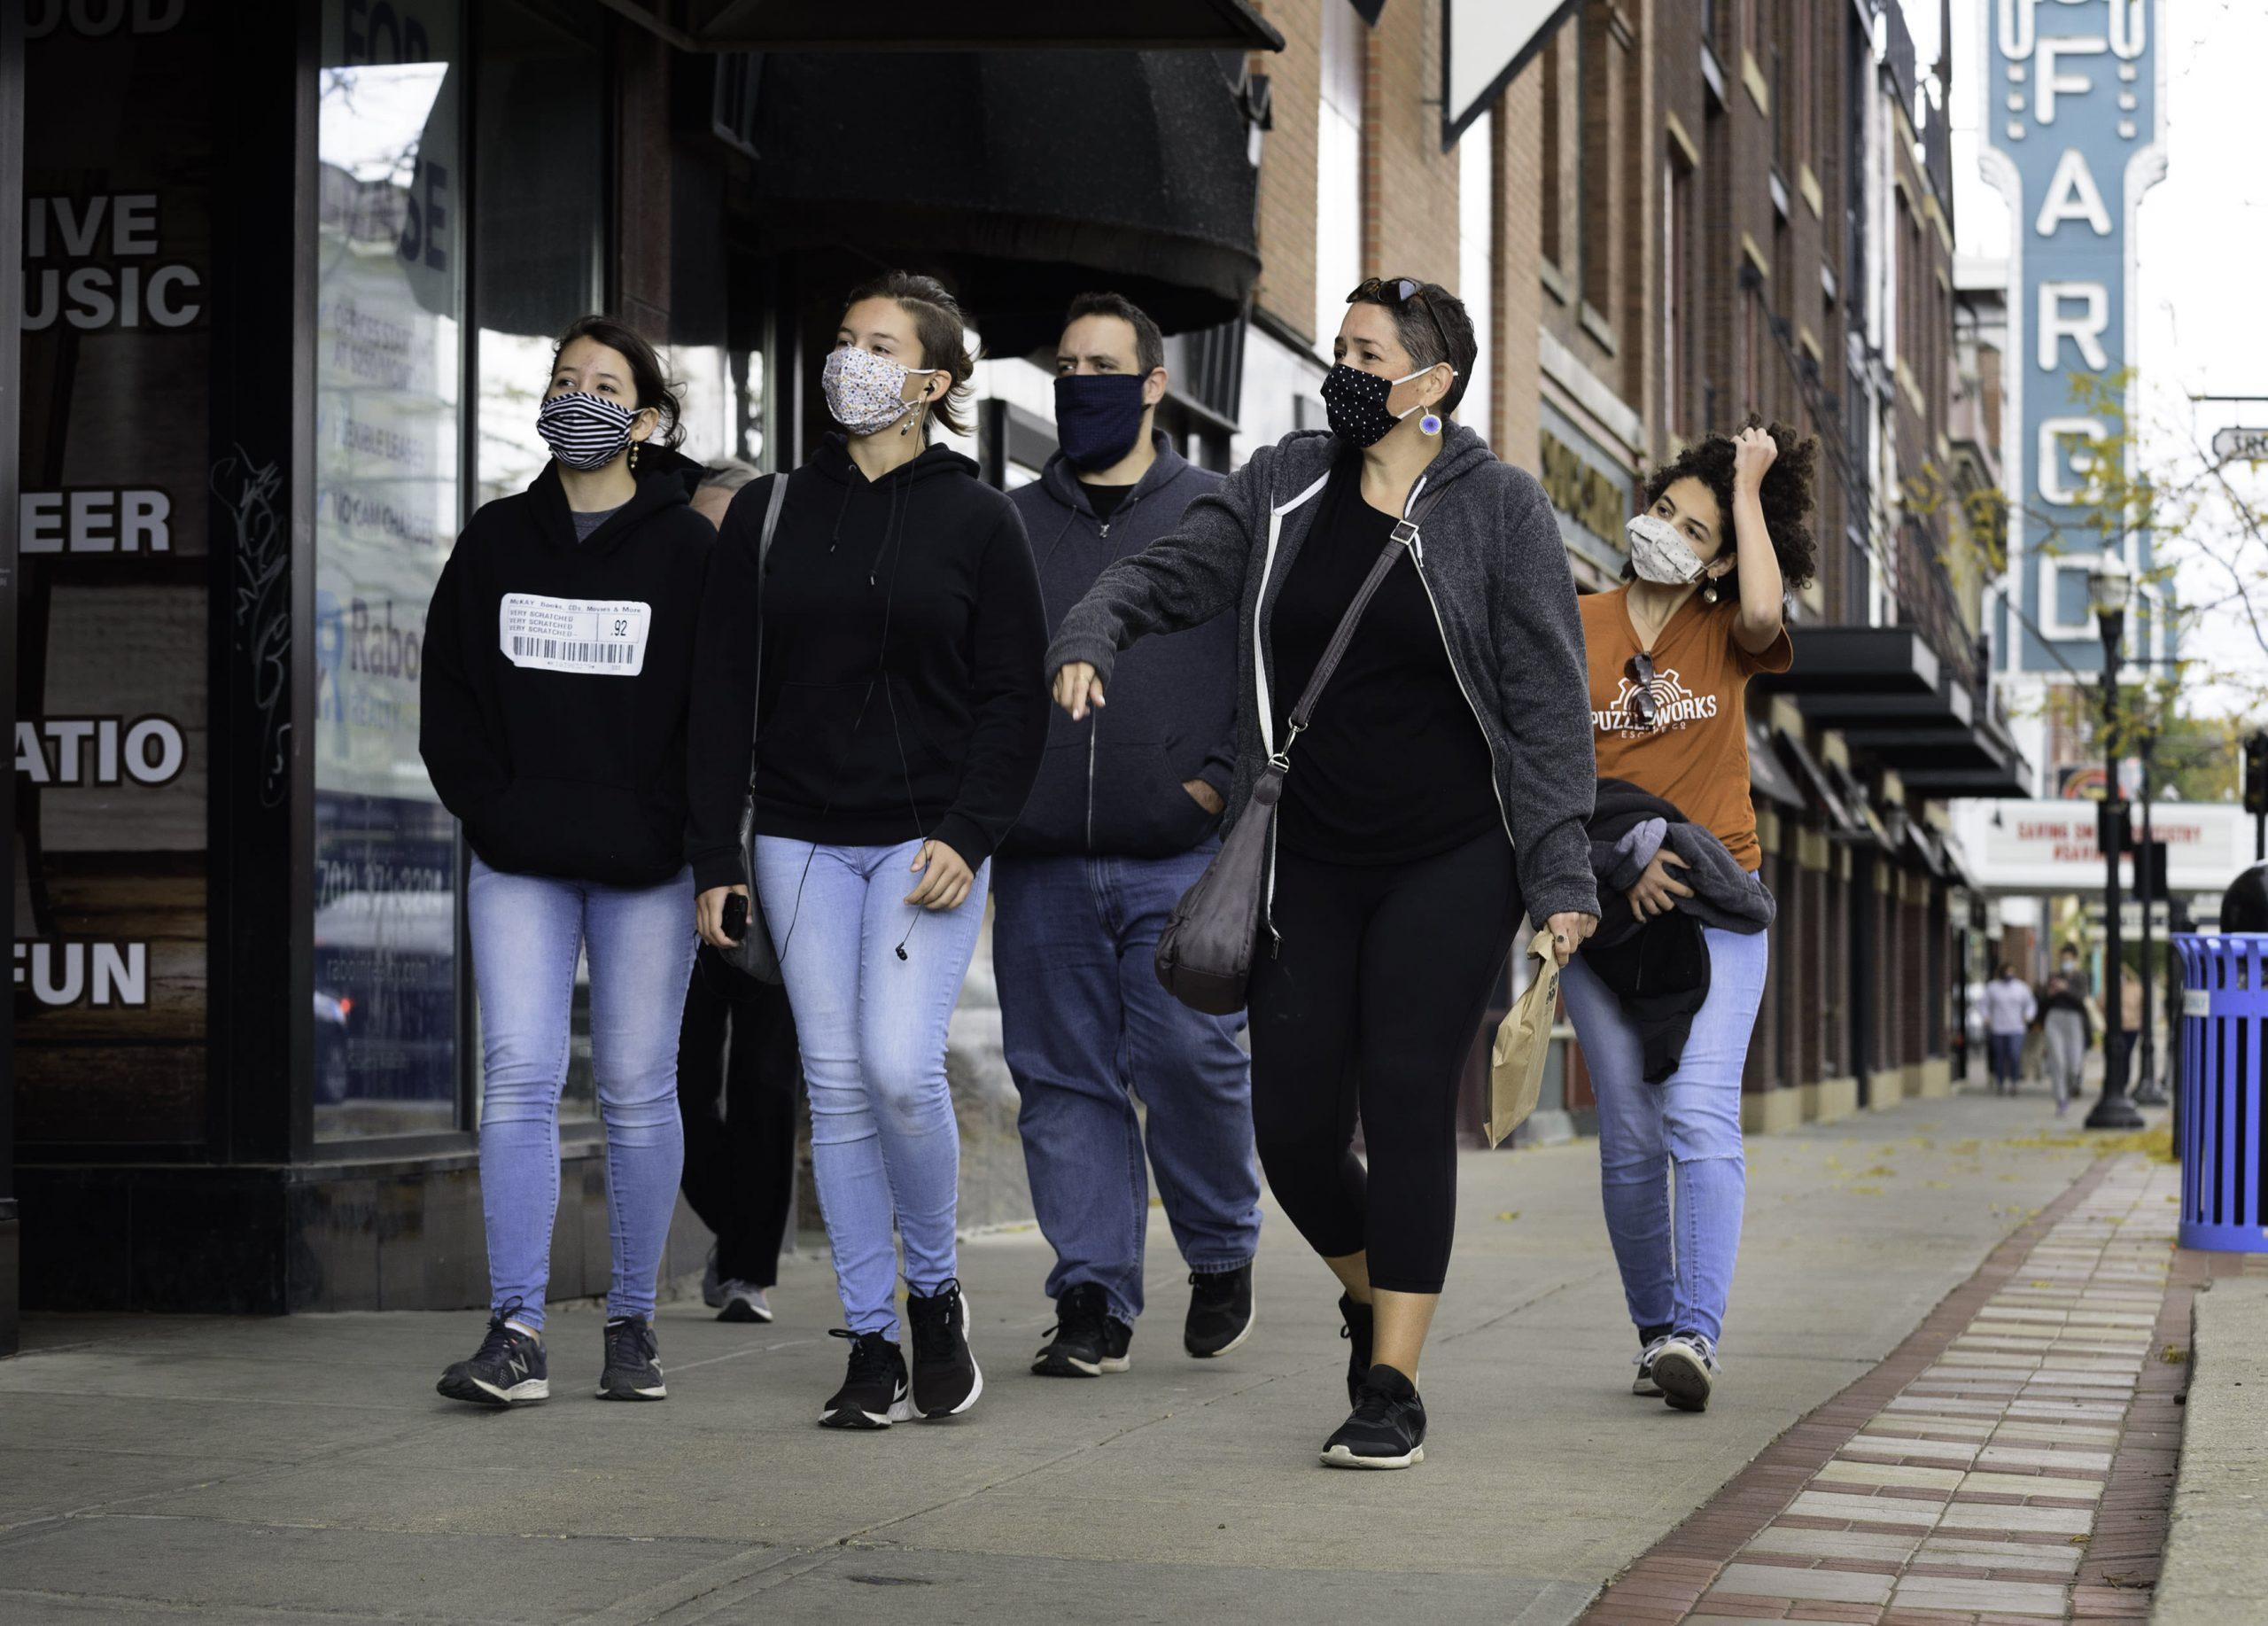 U.S. might face 'substantial third wave' of coronavirus circumstances, consultants warn